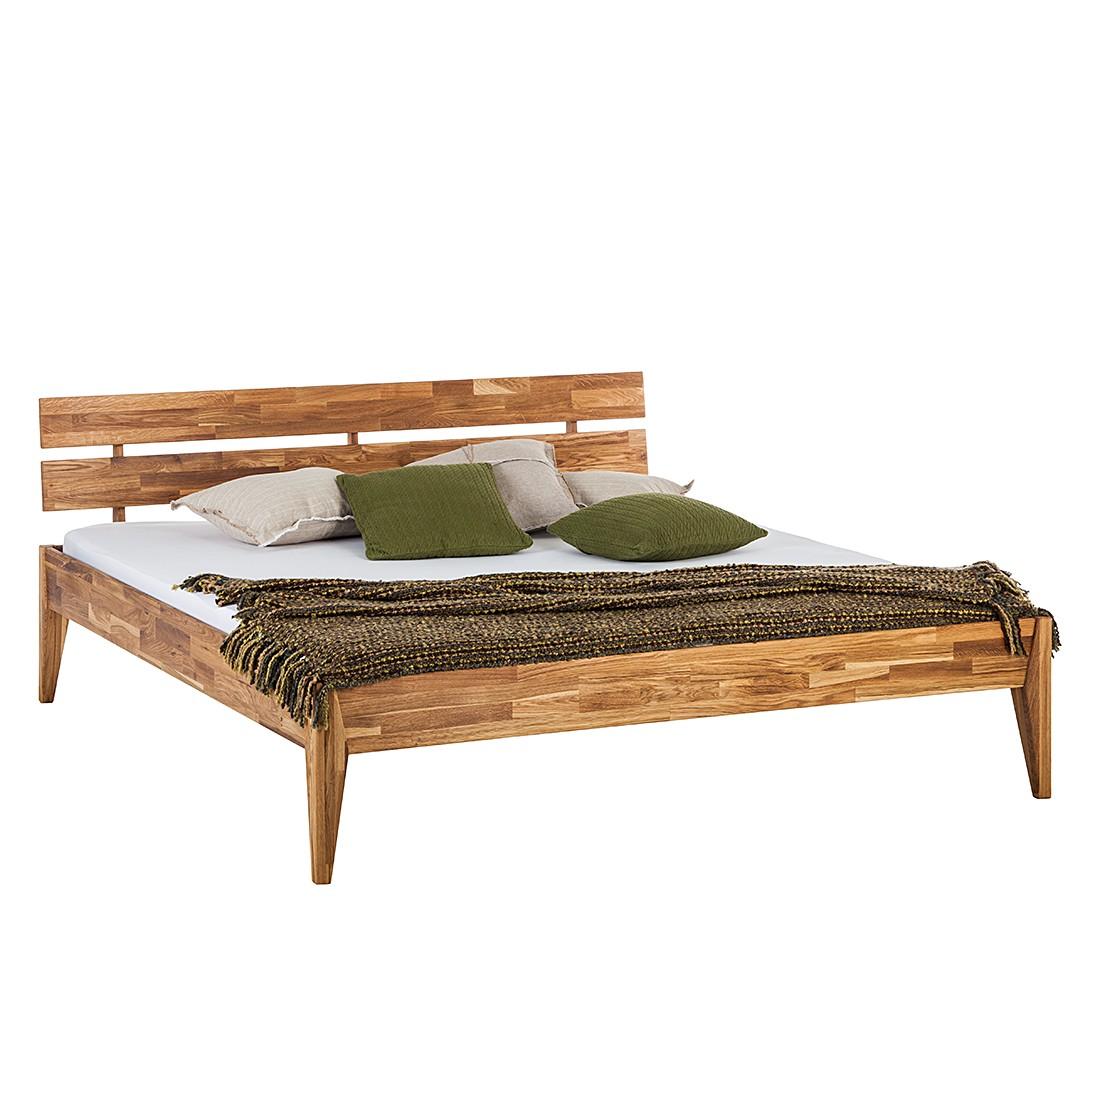 Lit en bois massif JillWOOD - 160 x 200cm - Chêne, Ars Natura